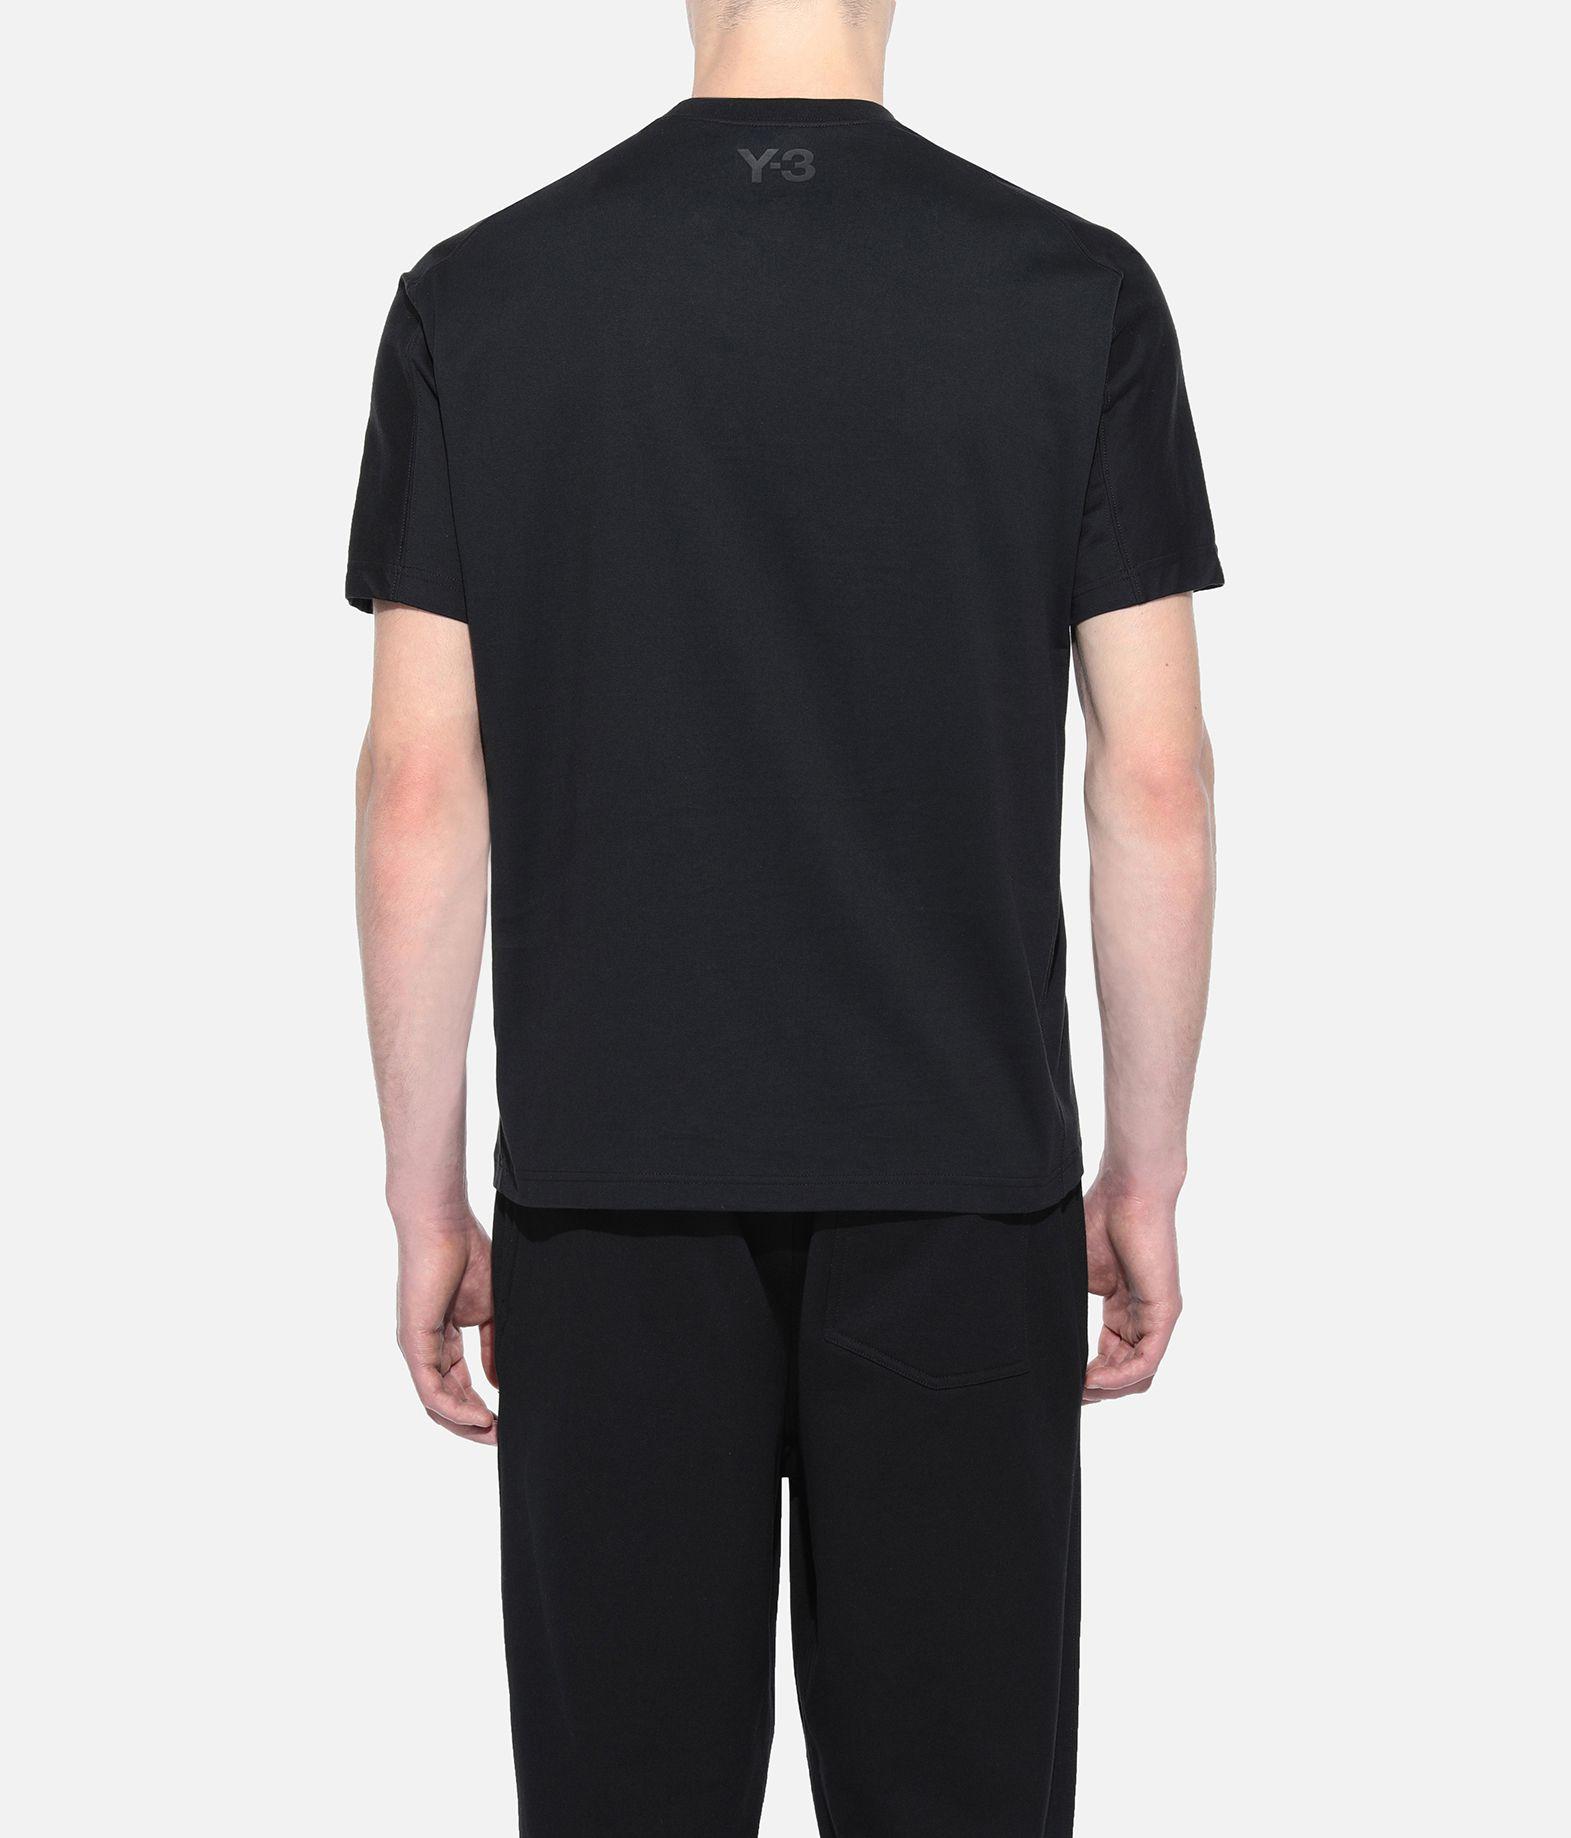 Y-3 Y-3 Yohji Letters Tee T-shirt maniche corte Uomo d